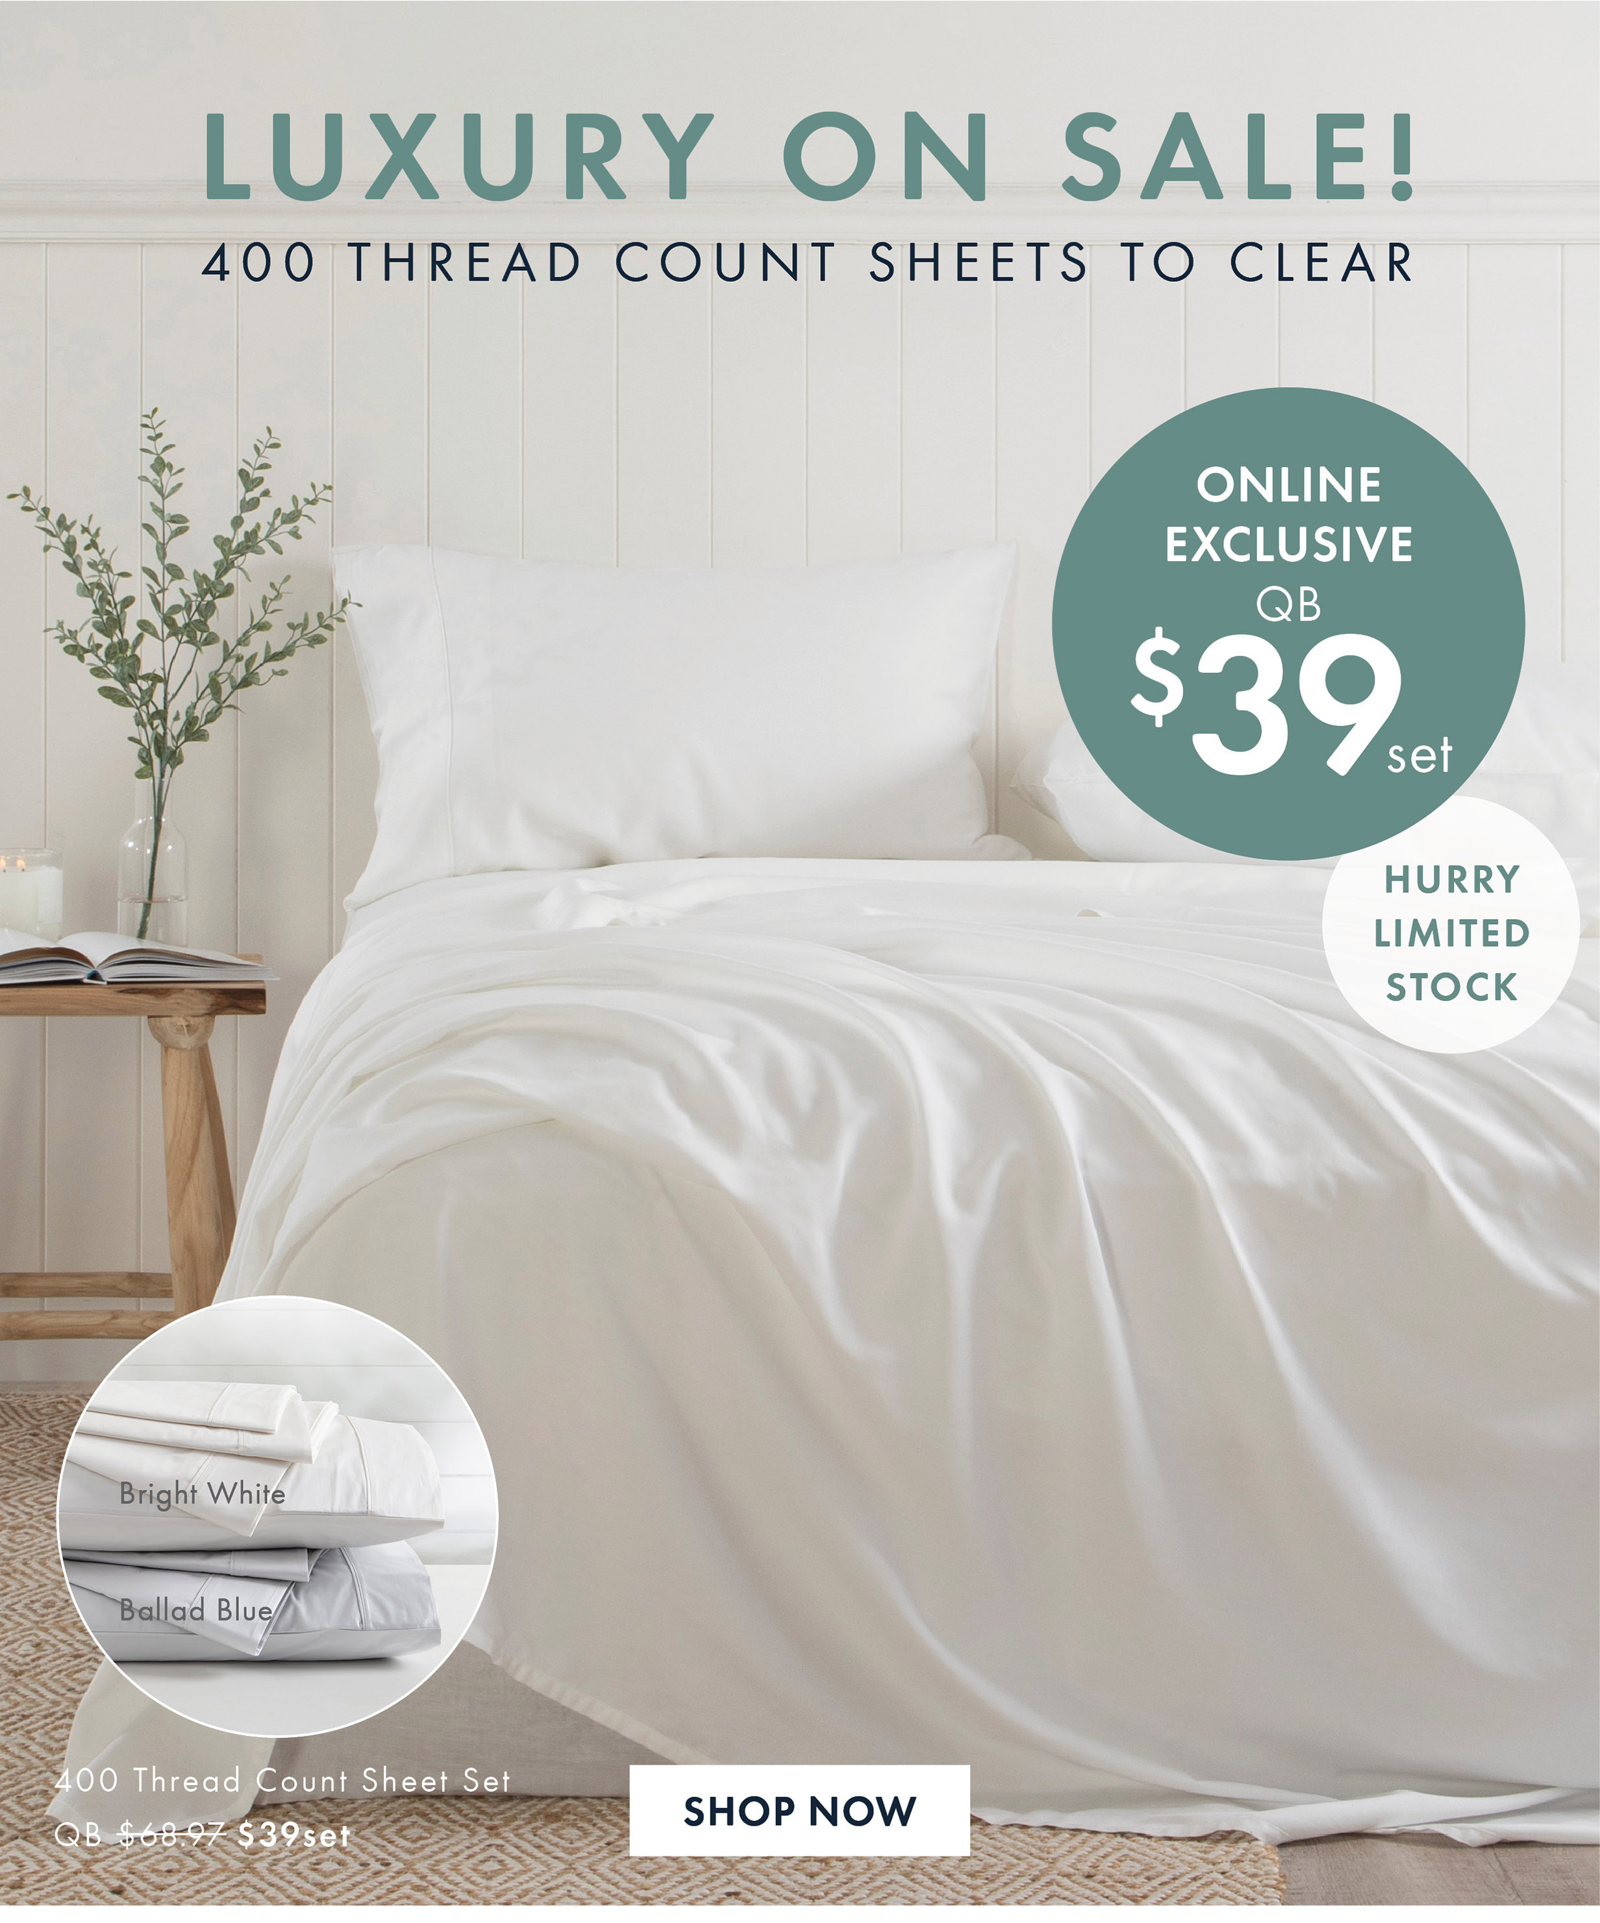 Luxury On Sale | 400 Thread Count Sheet Set QB $39set | Shop Now